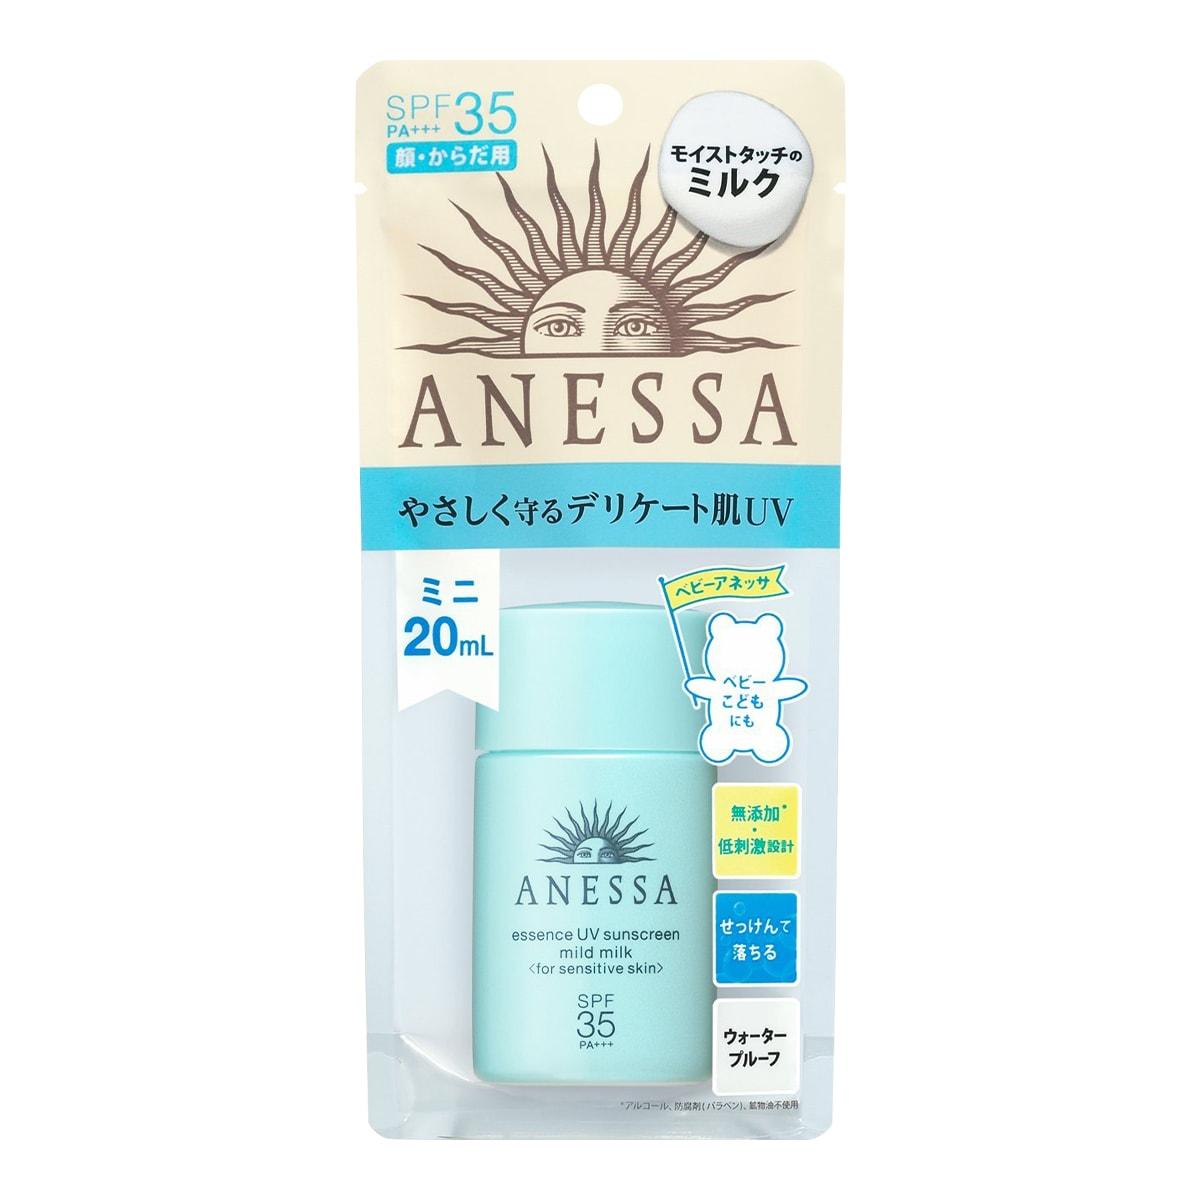 SHISEIDO ANESSA Essence UV Sunscreen Mild Milk 20ml